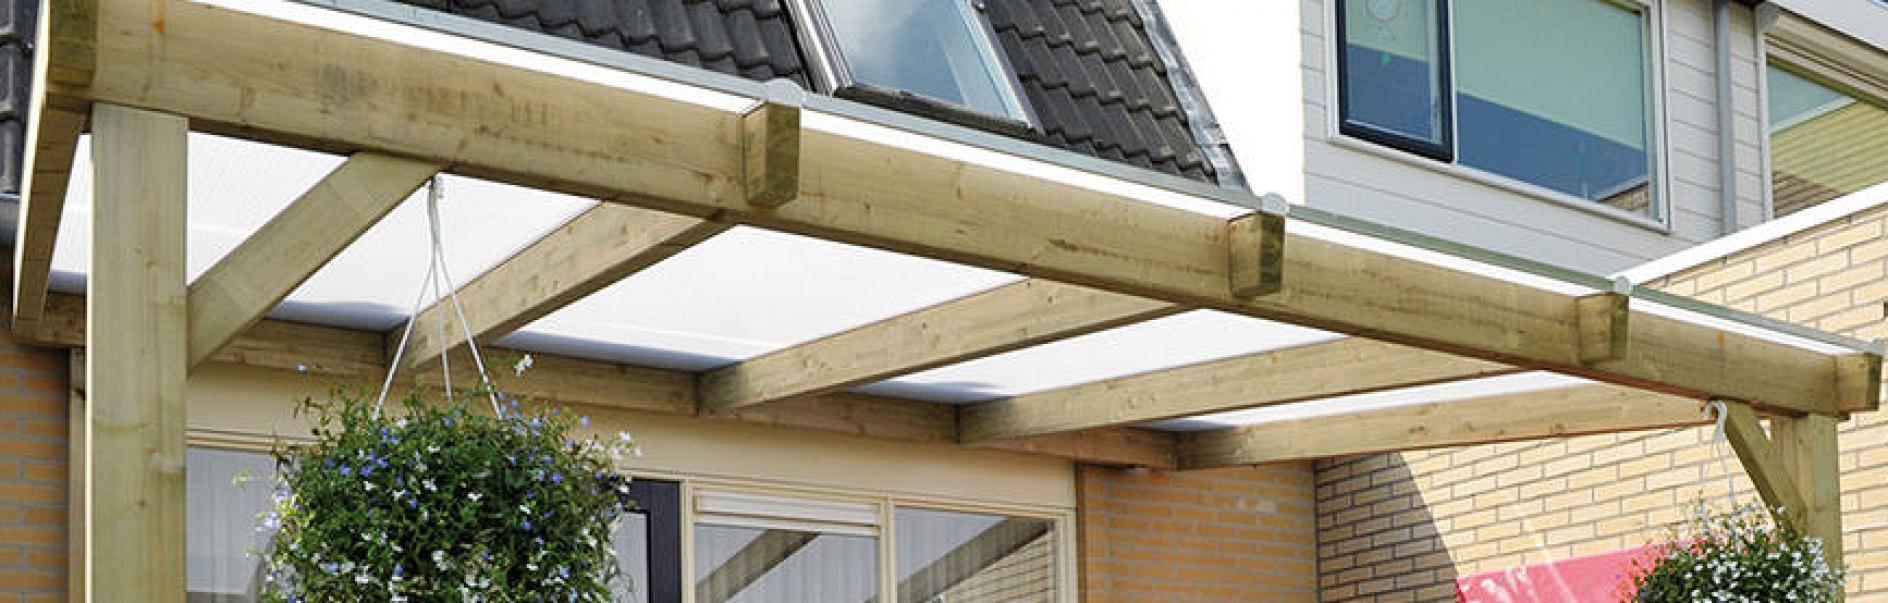 Bekend Terrasoverkapping of veranda maken YJ59